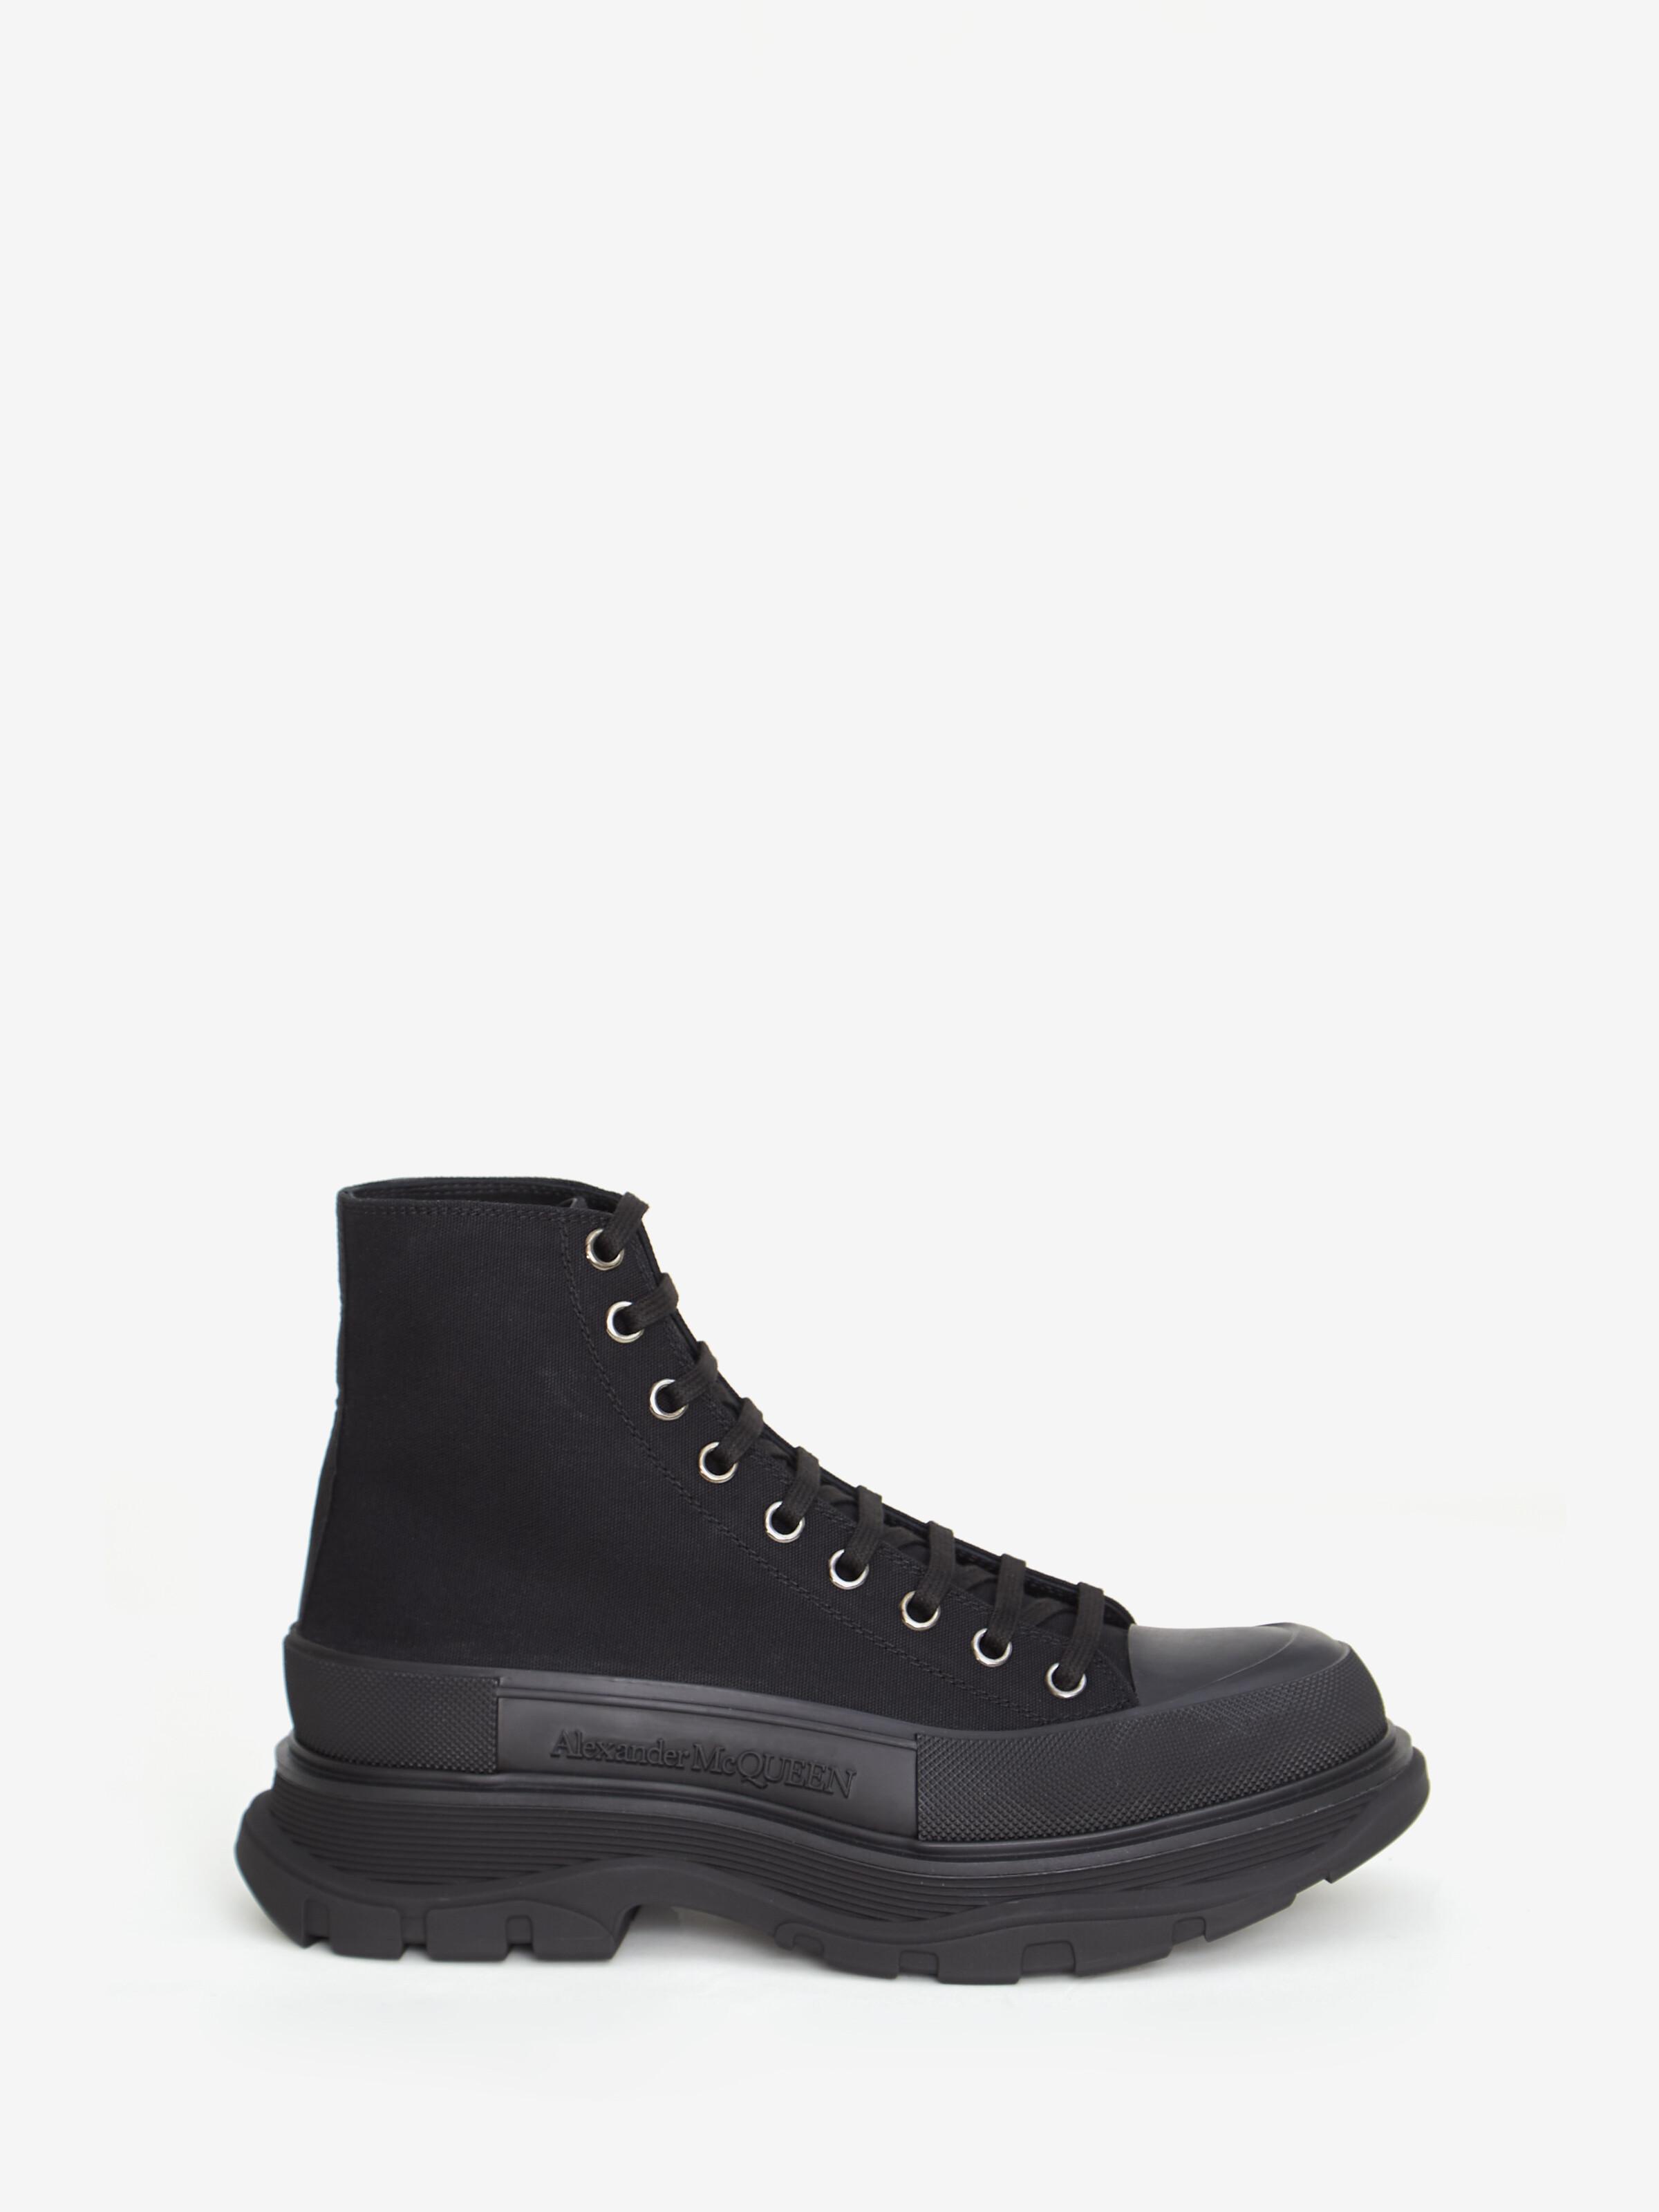 Tread Slick Boots in Black   Alexander